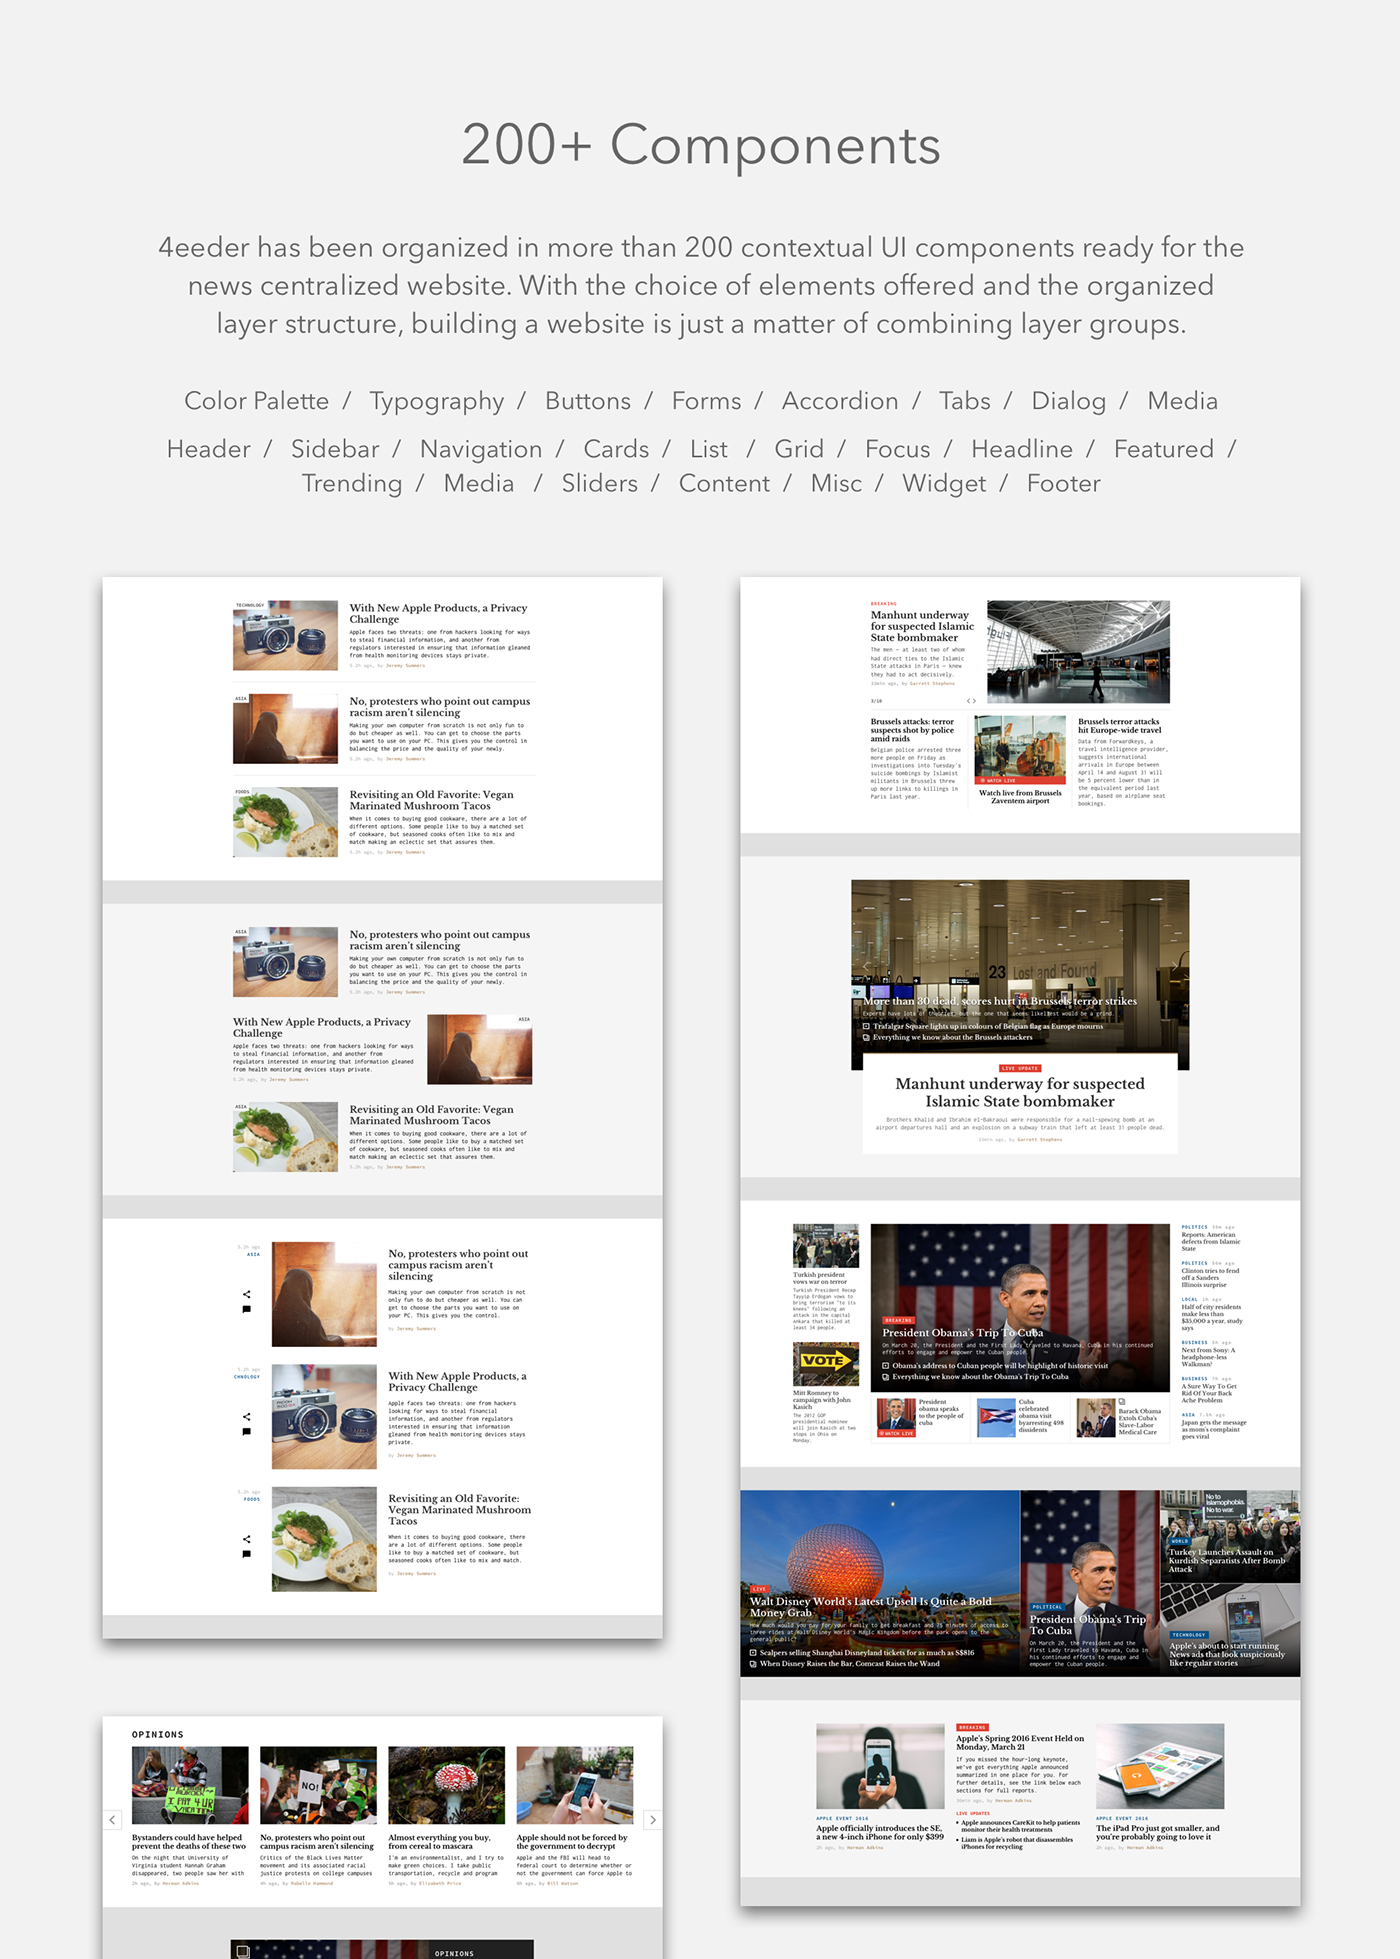 Interface magazine media mobile news press professional Responsive sketch tablet UI ux vector Web Website